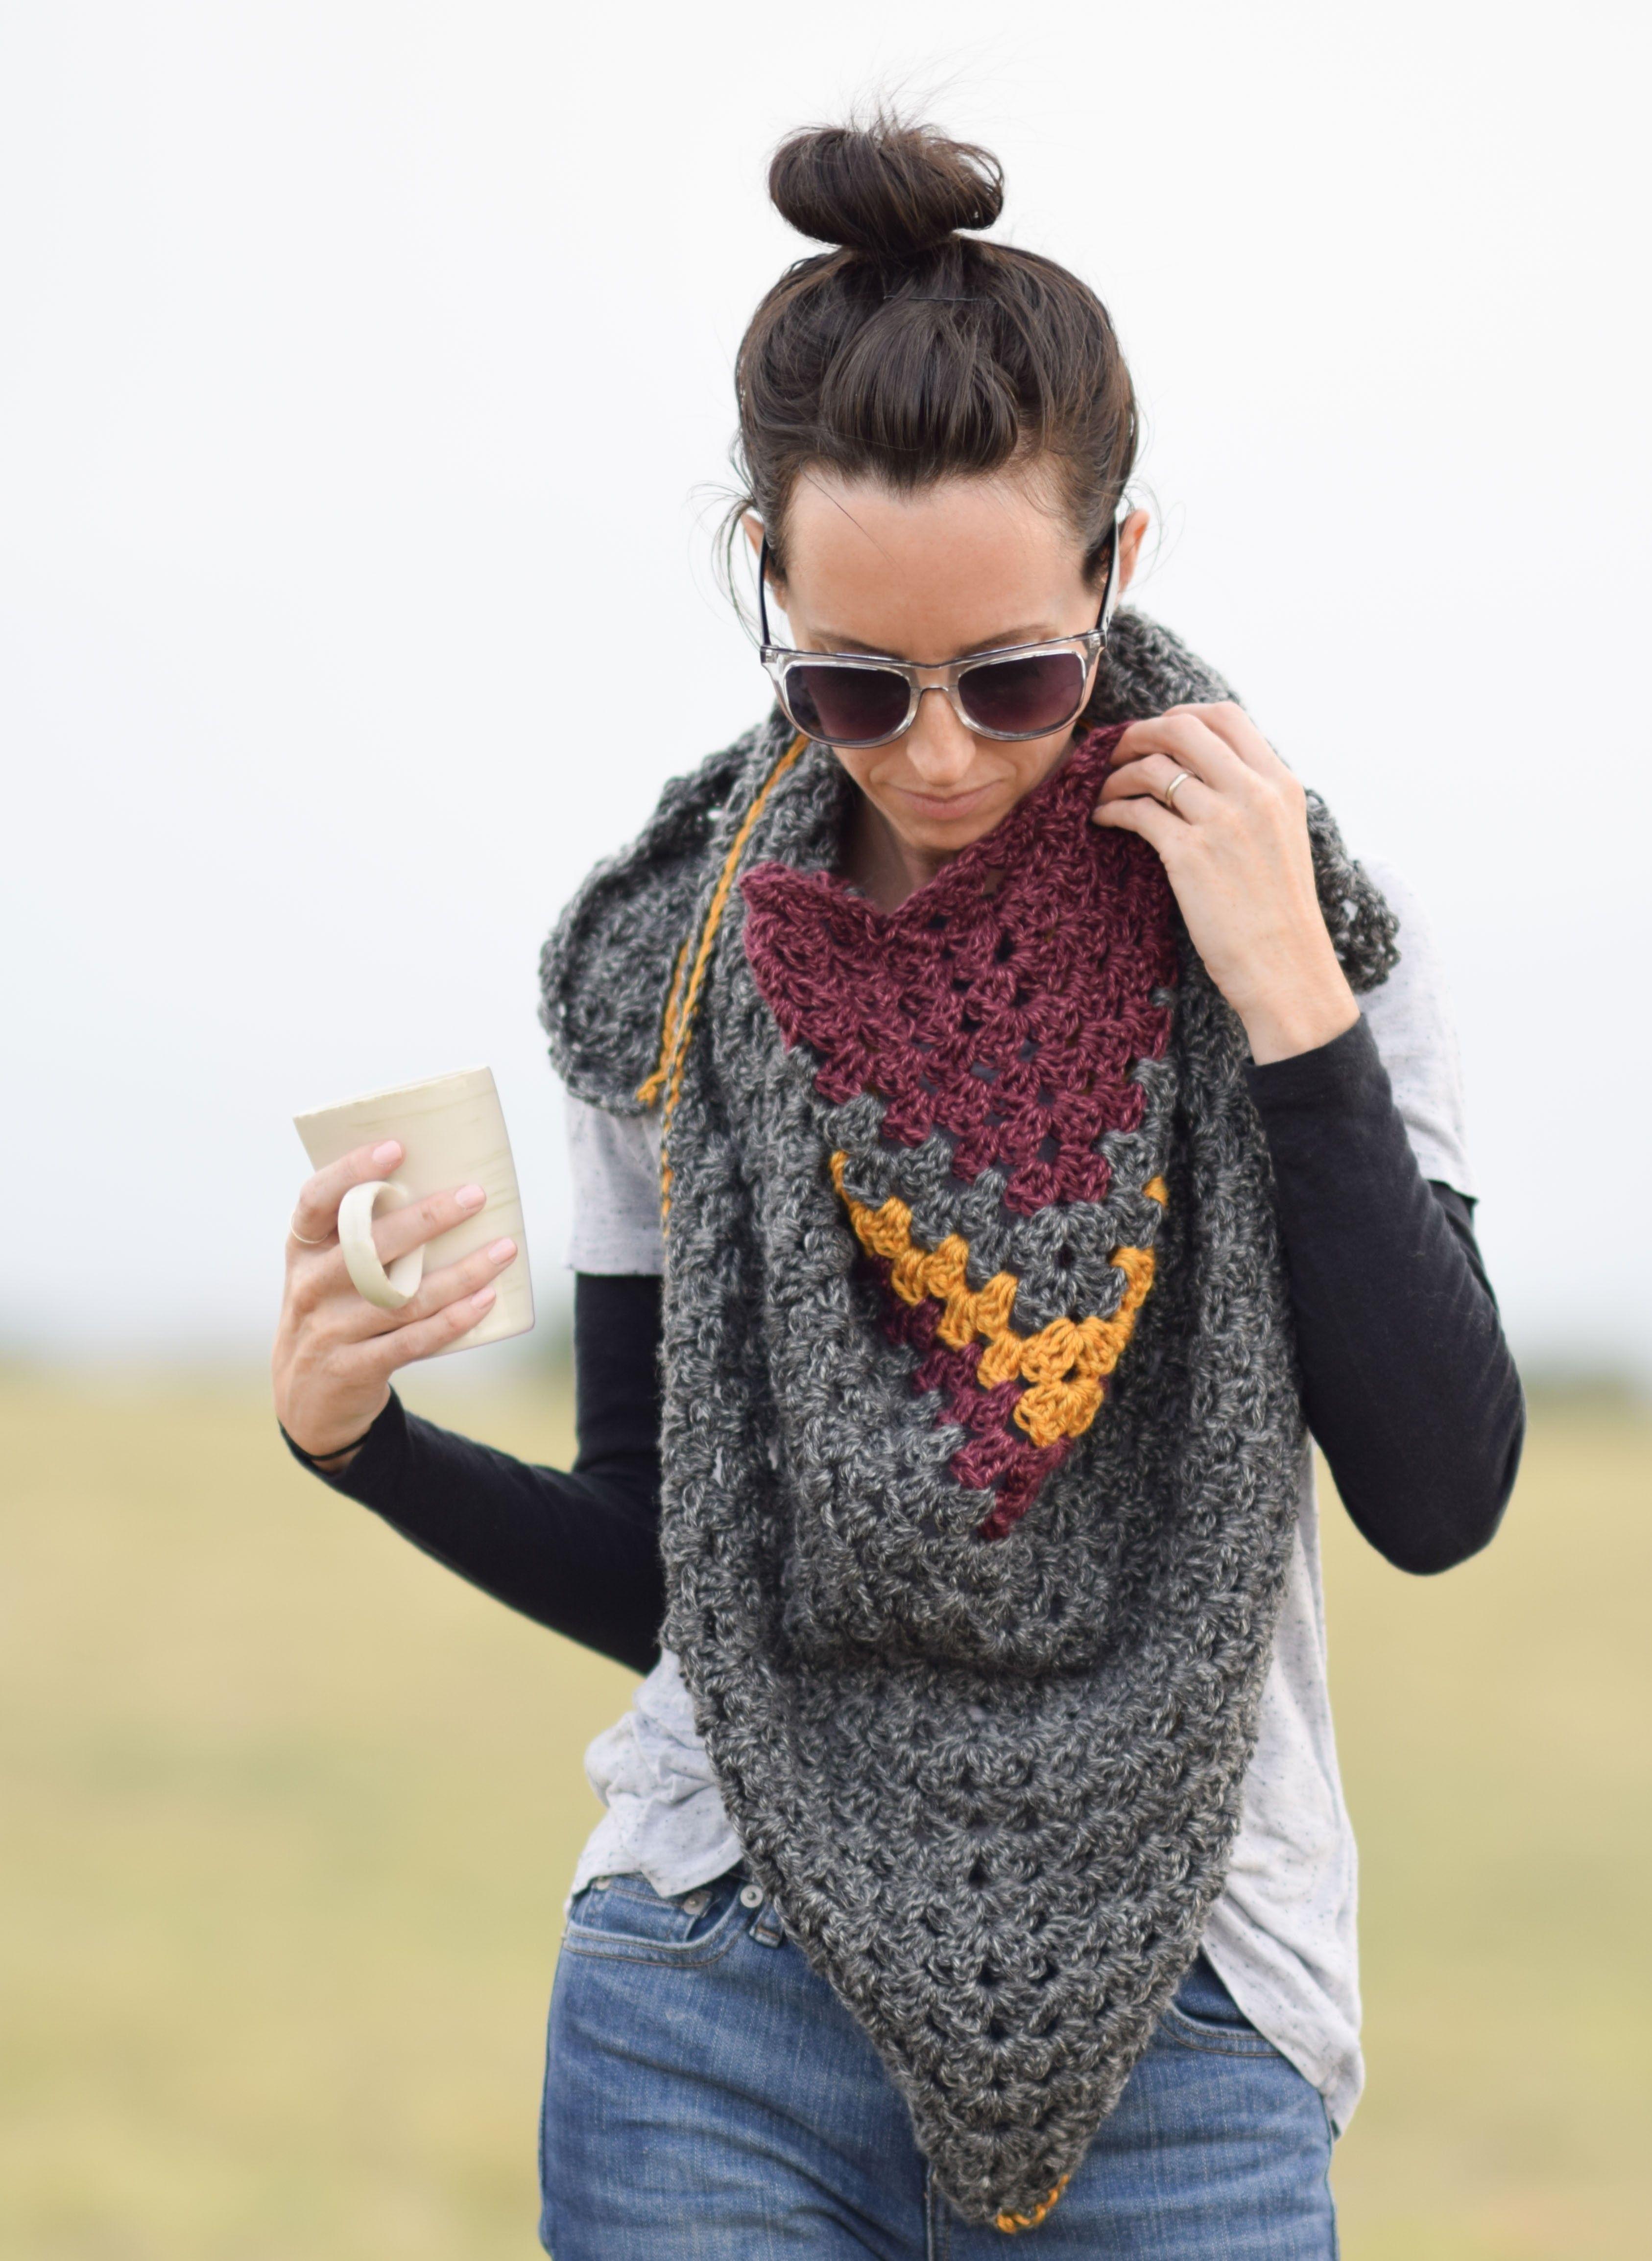 Crochet Kit - Smoky Mountains Triangle Wrap   Pinterest   Tejido